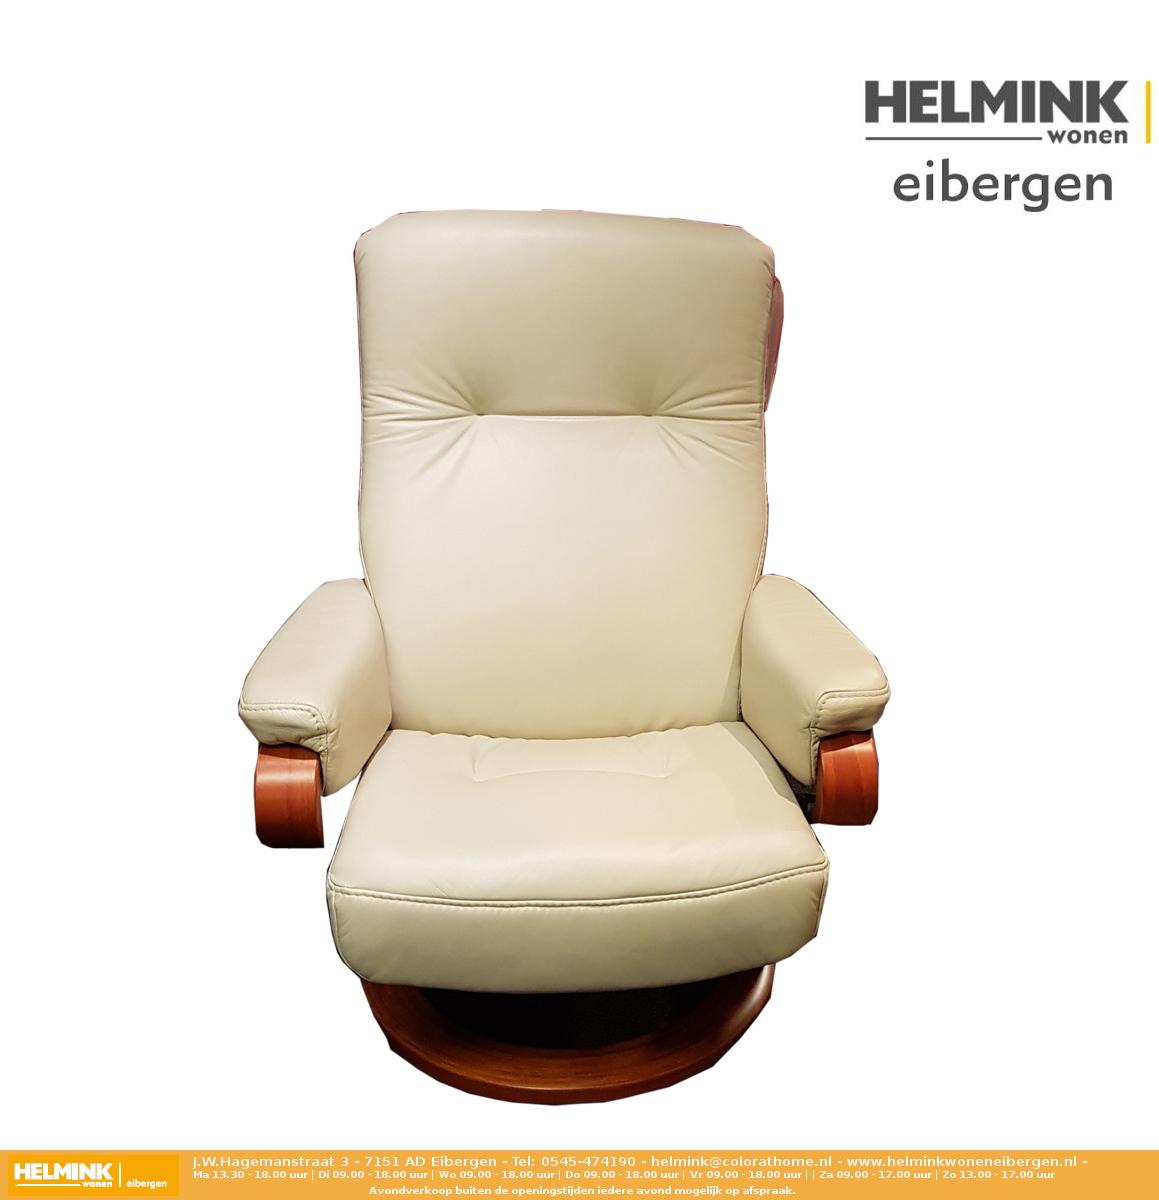 zerostress relaxfauteuil 3870047 helmink wonen eibergen. Black Bedroom Furniture Sets. Home Design Ideas